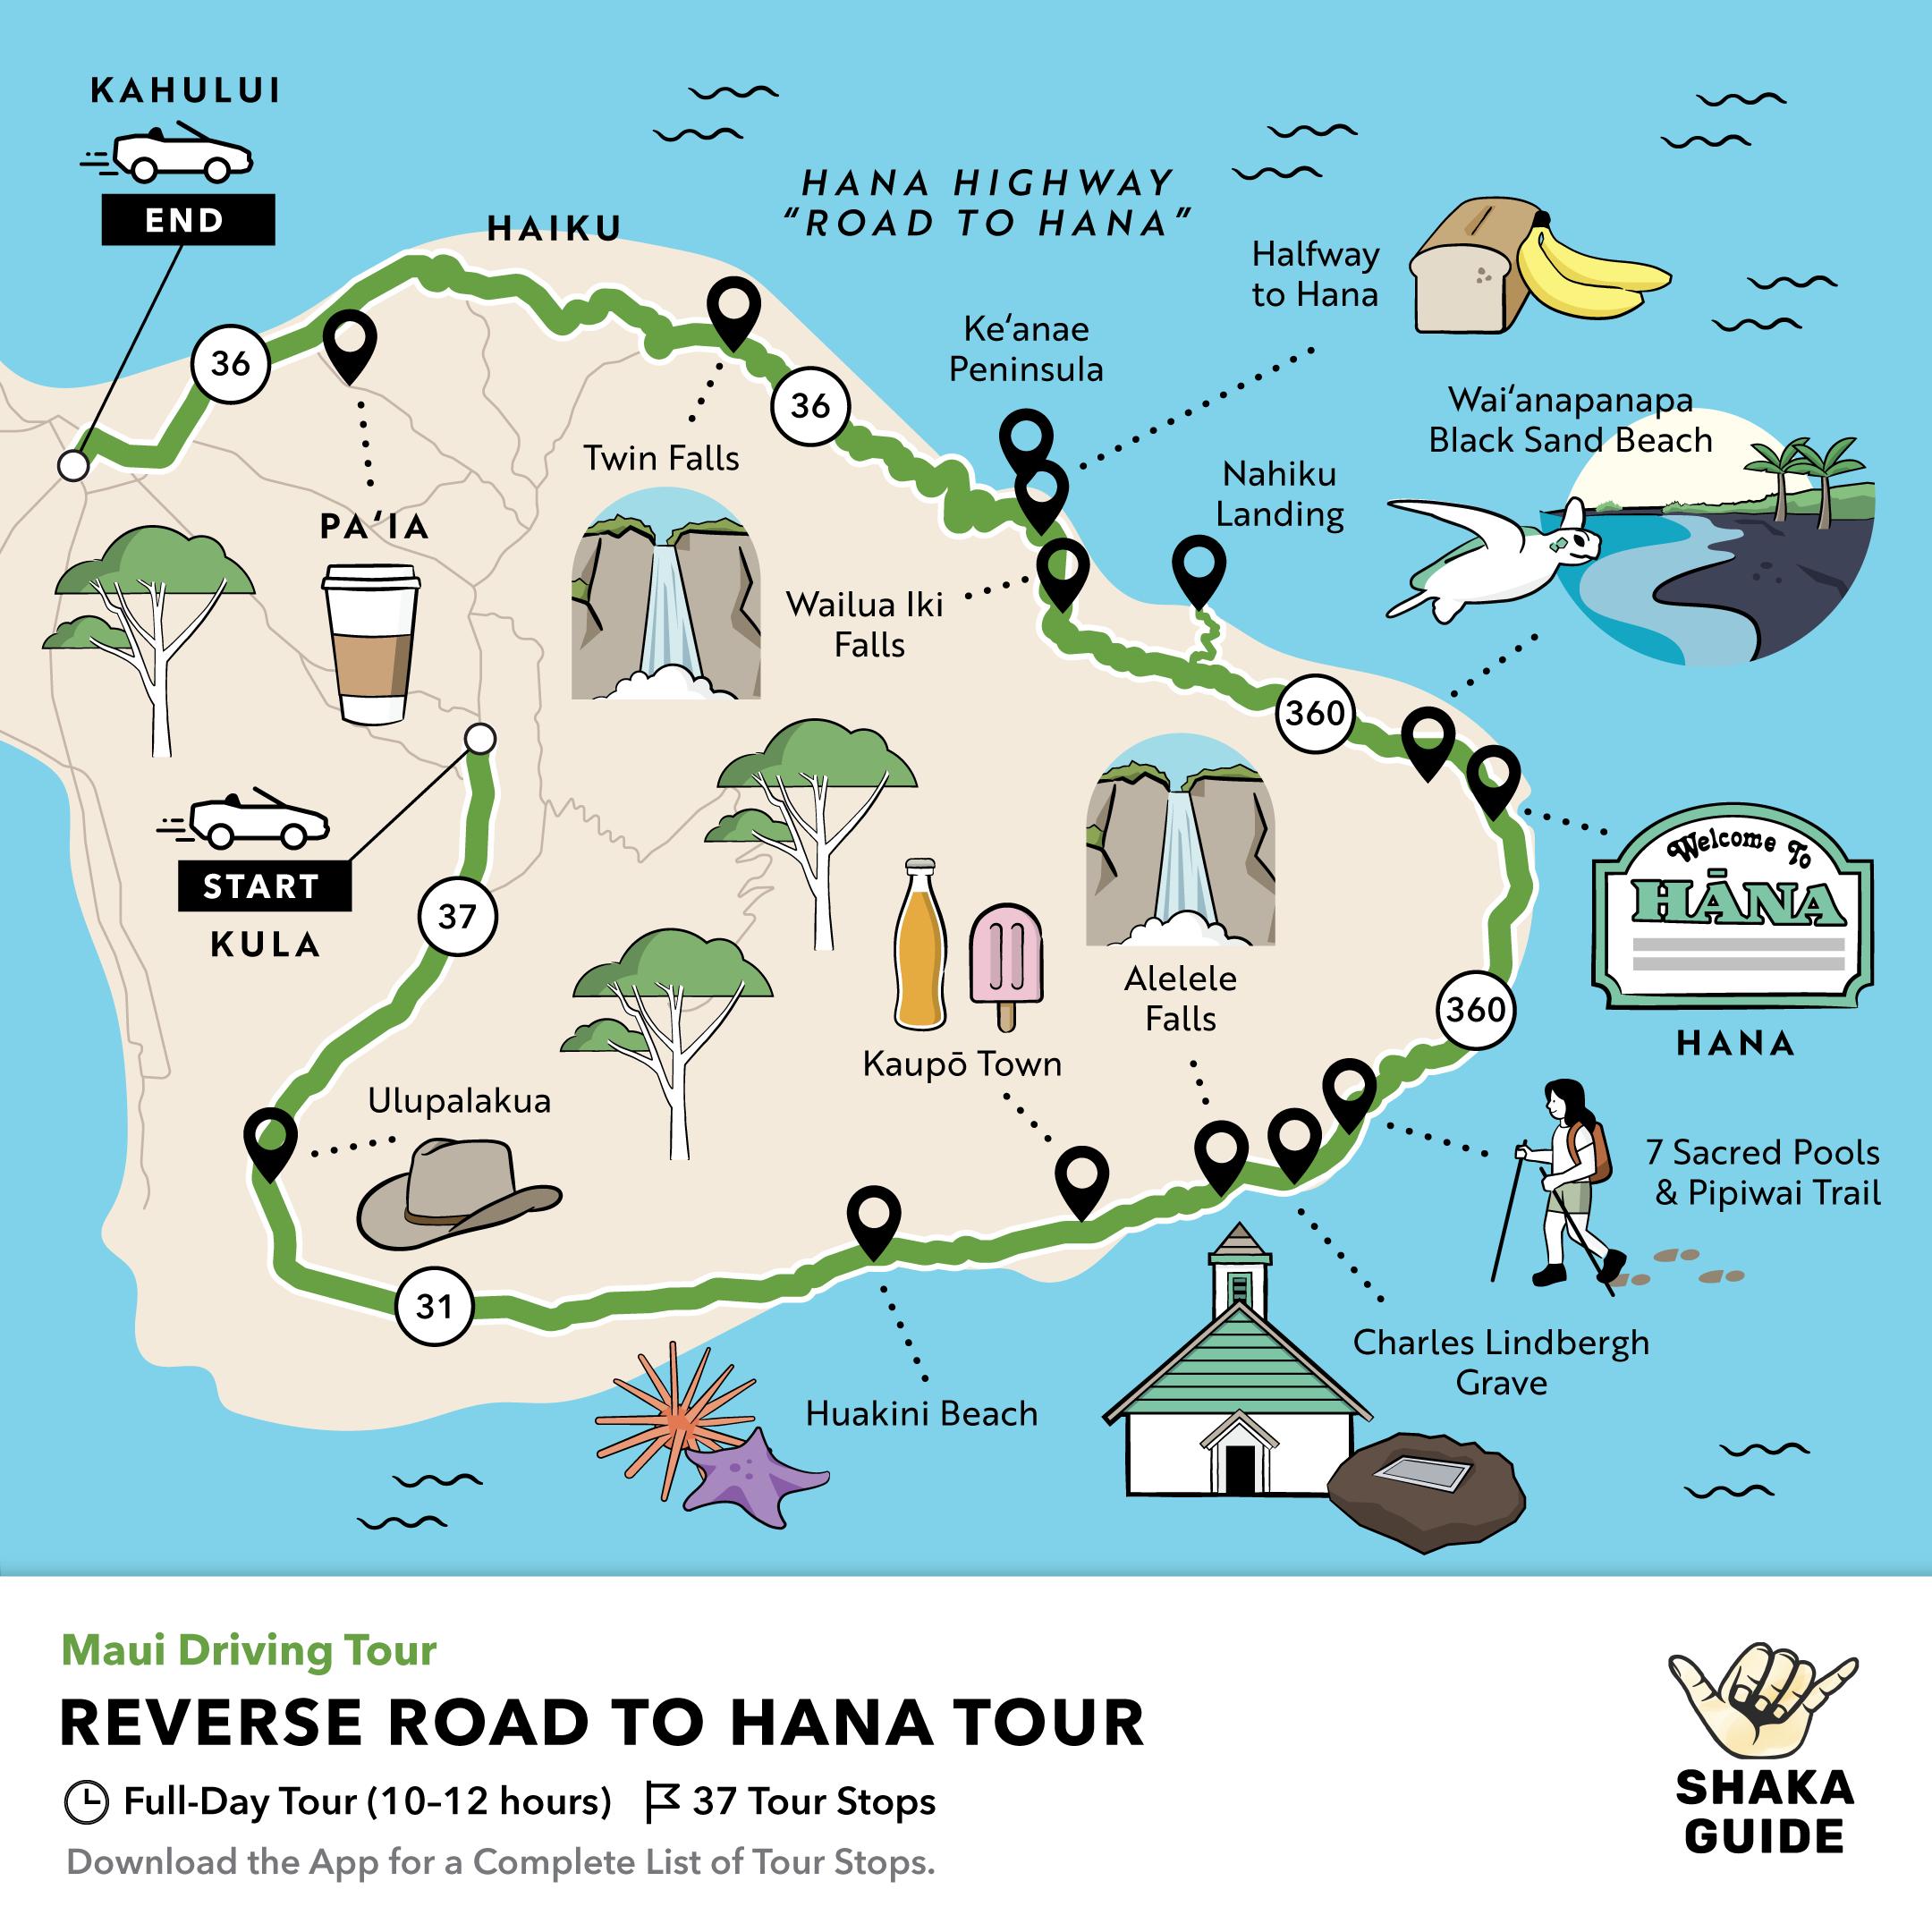 Shaka Guide's Reverse Road to Hana Driving Tour, Shaka Guide Road to Hana Tour Comparison